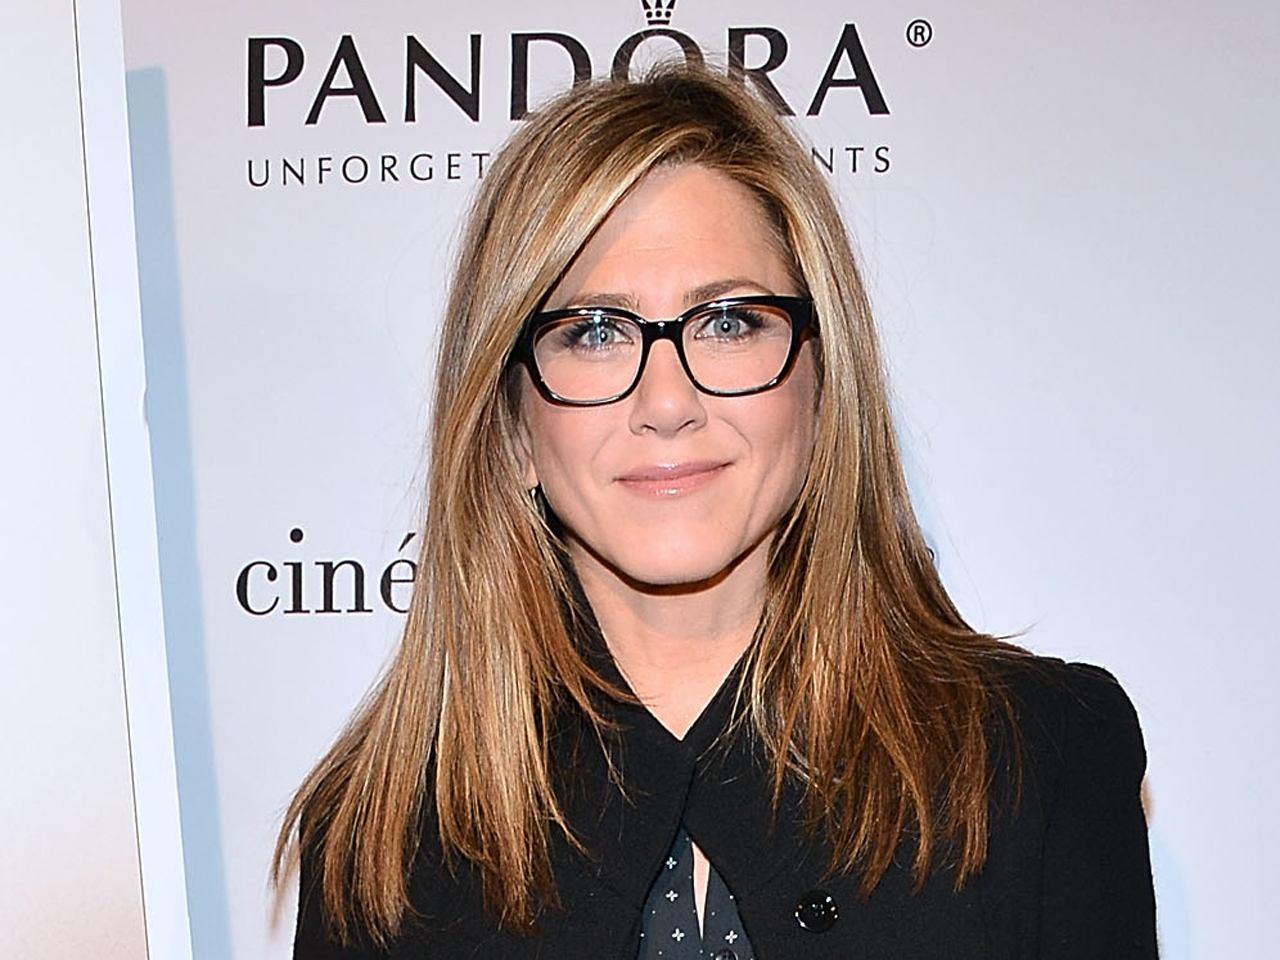 jennifer glasses 20 Things You Never Knew About Jennifer Aniston